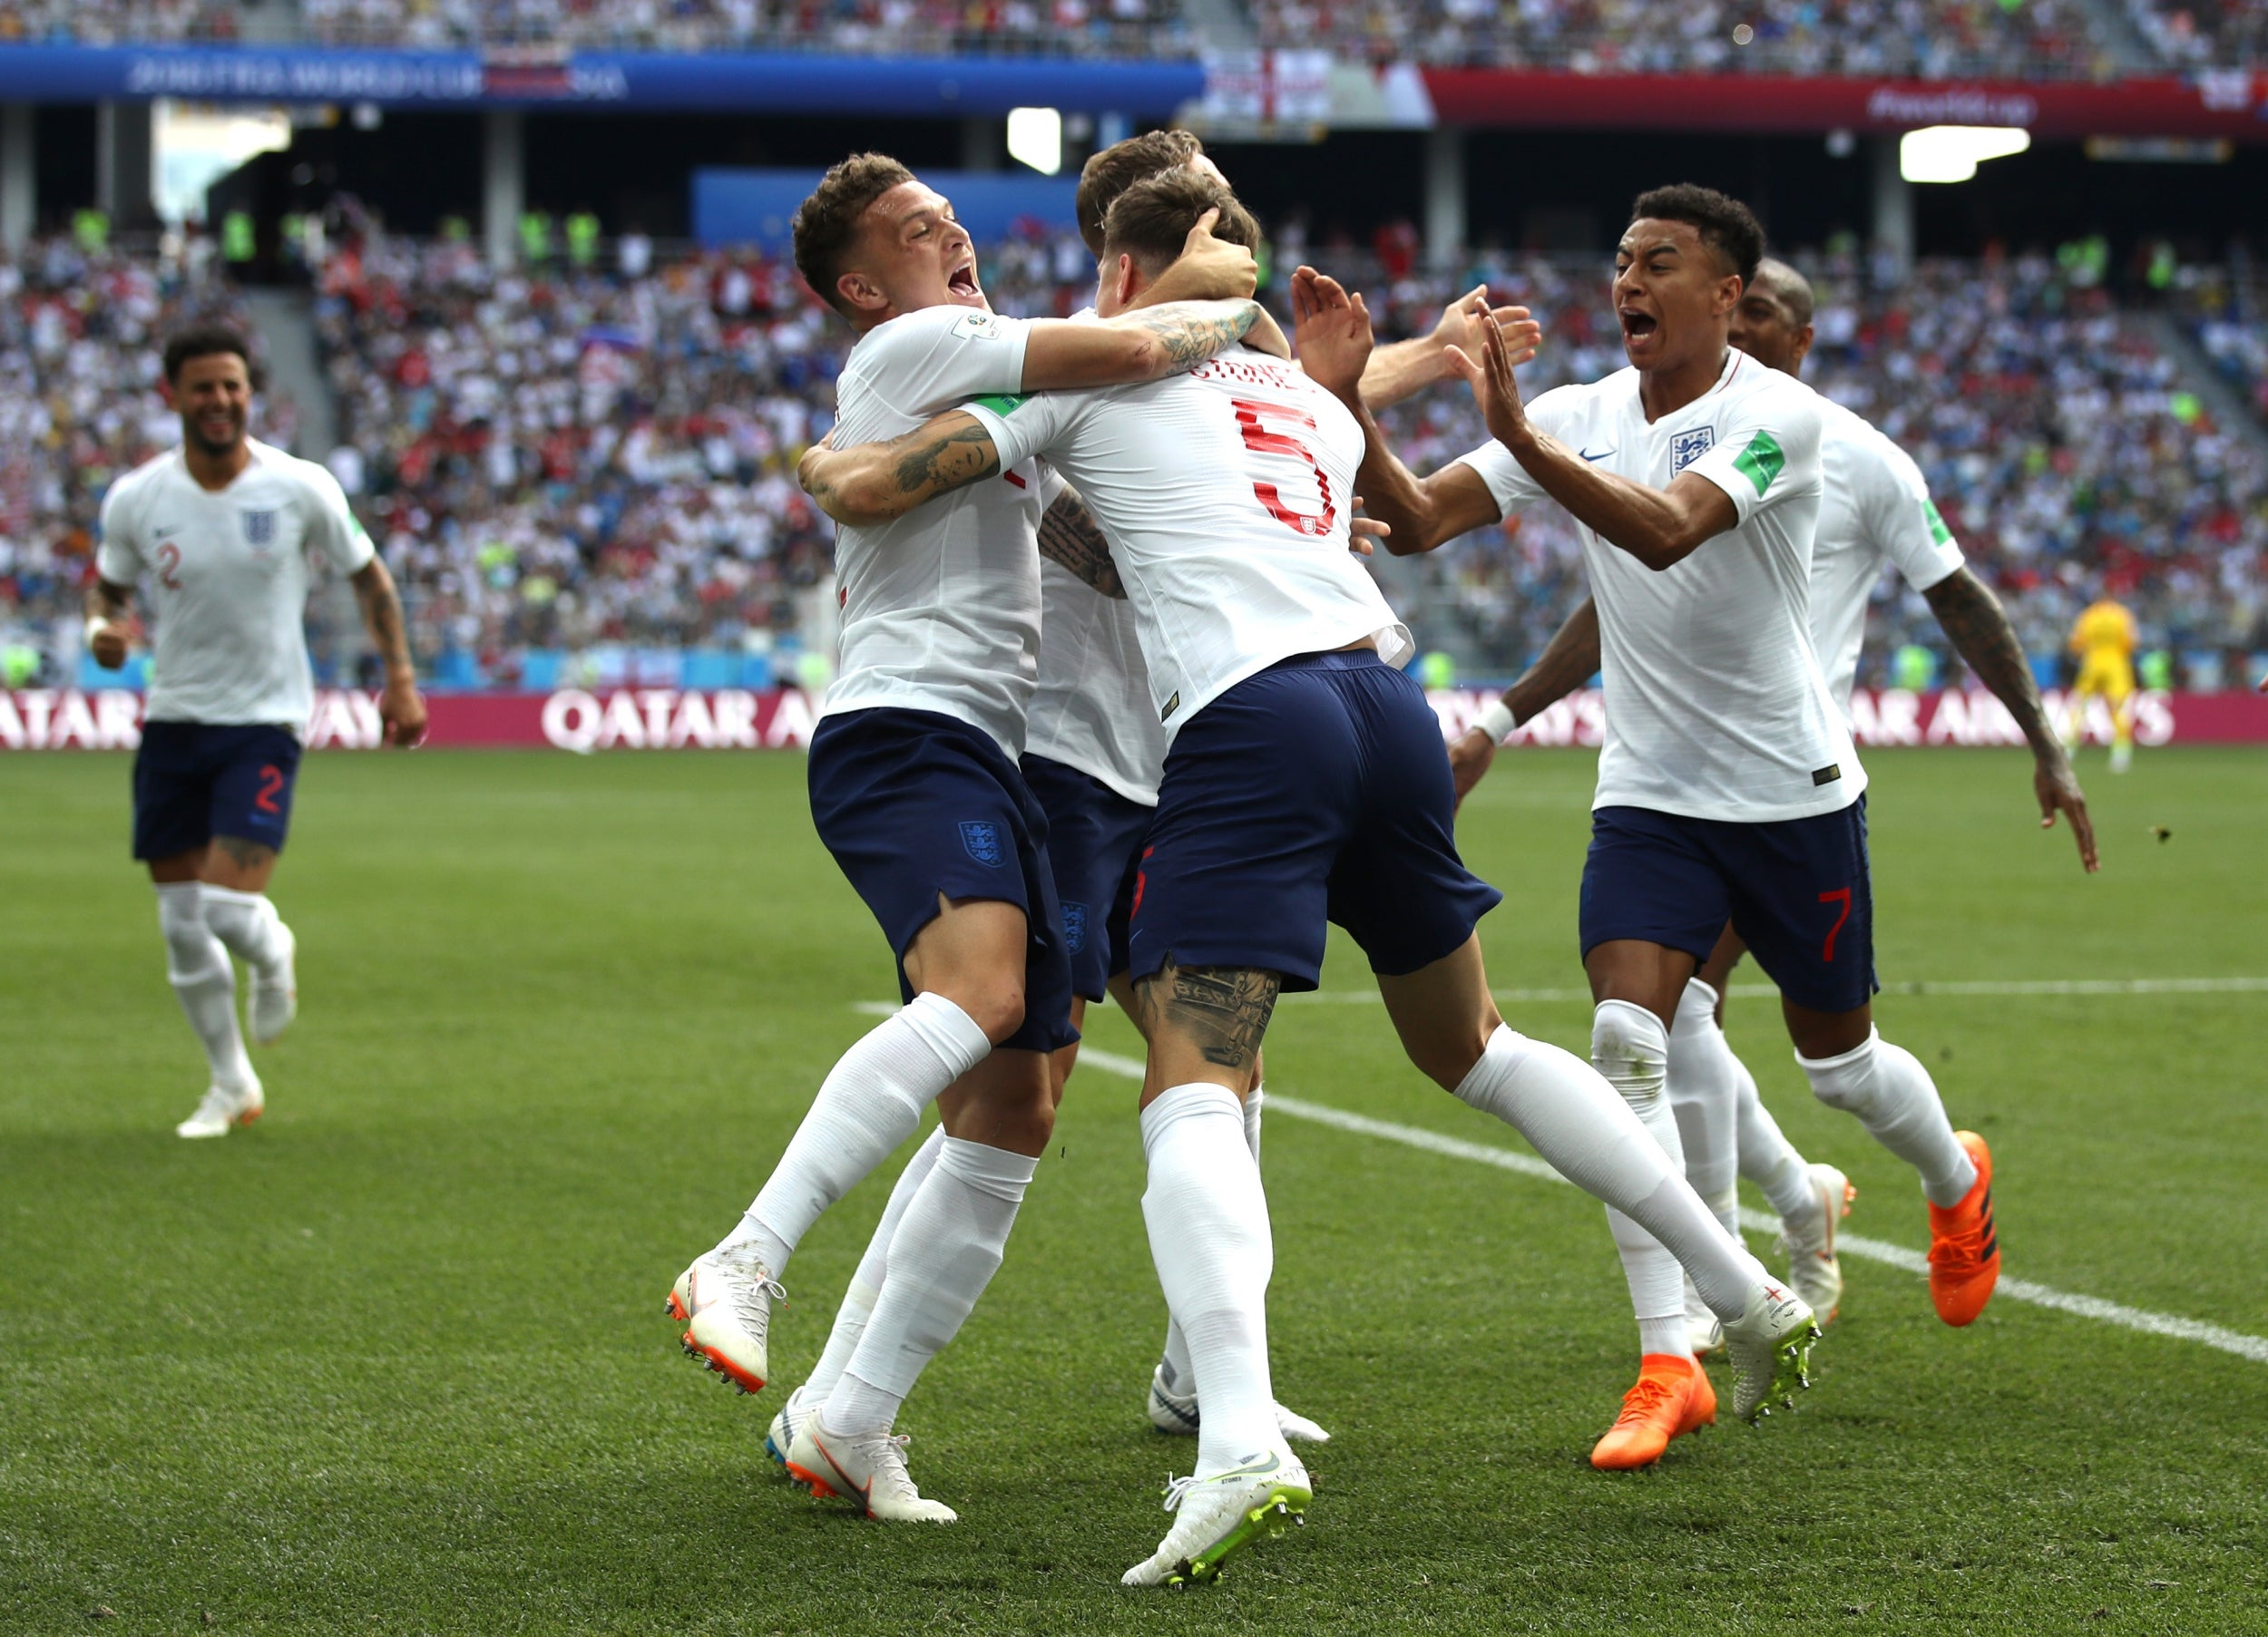 England Panama Wm